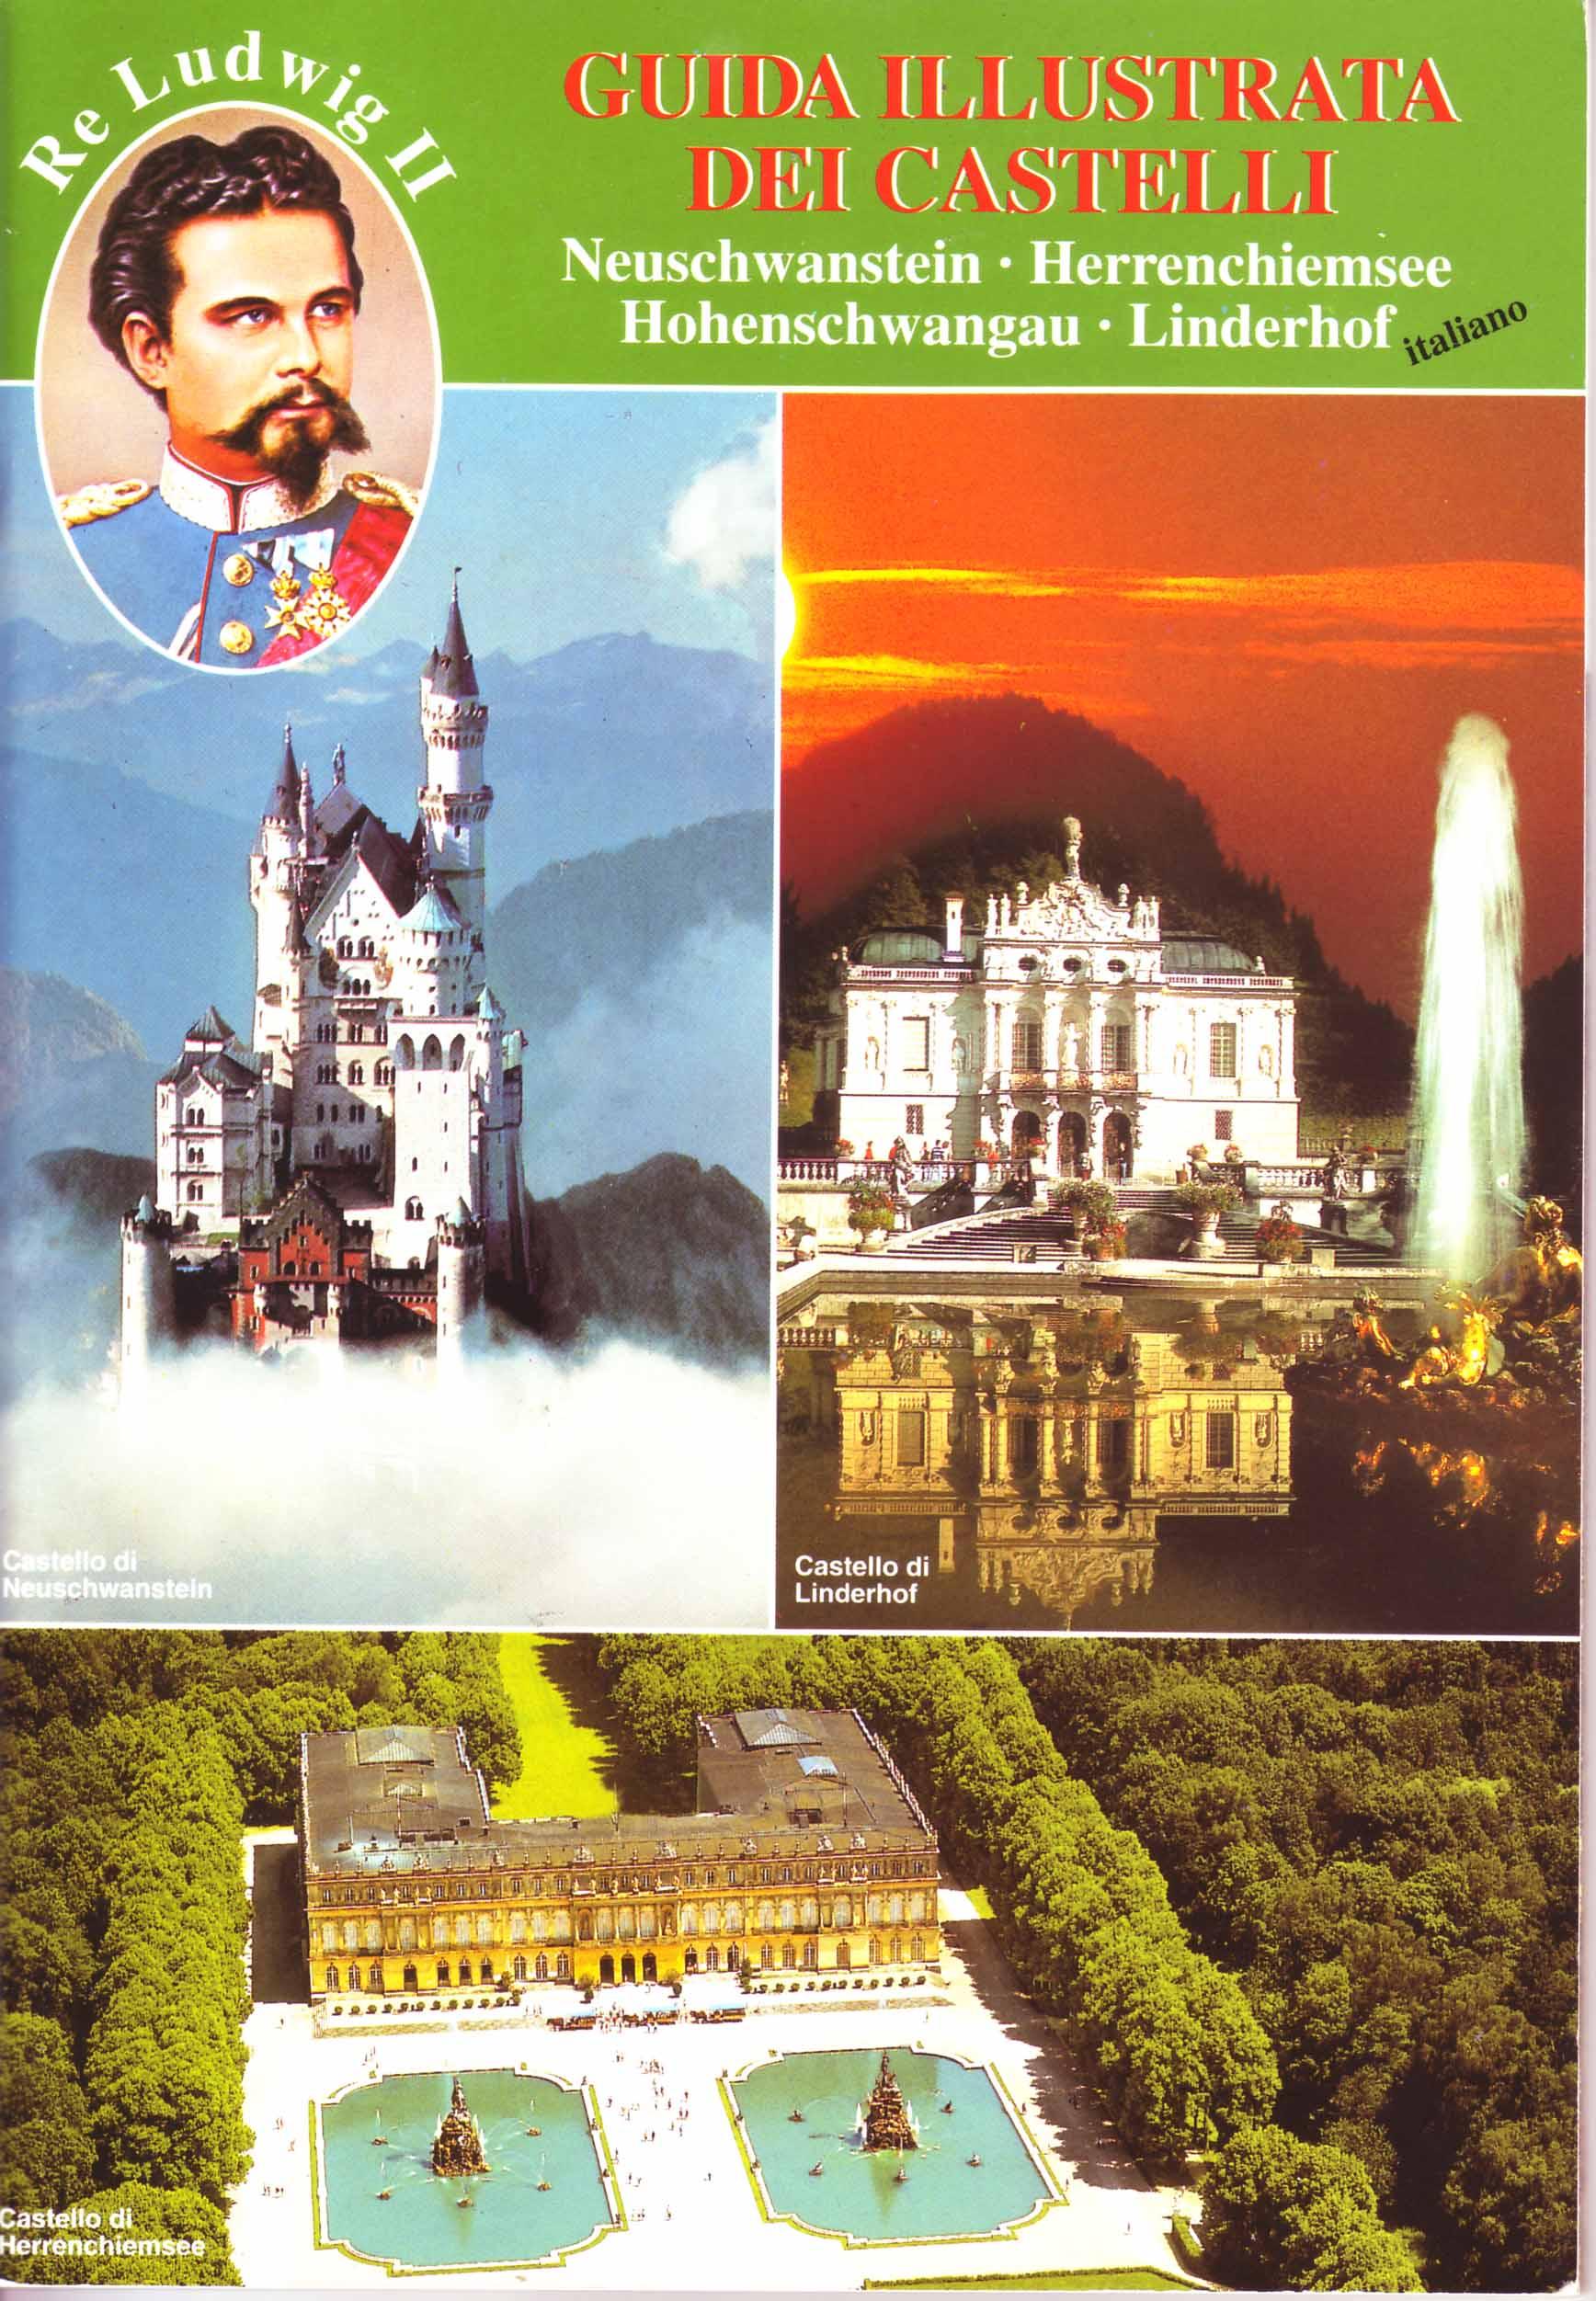 Guida illustrata dei castelli